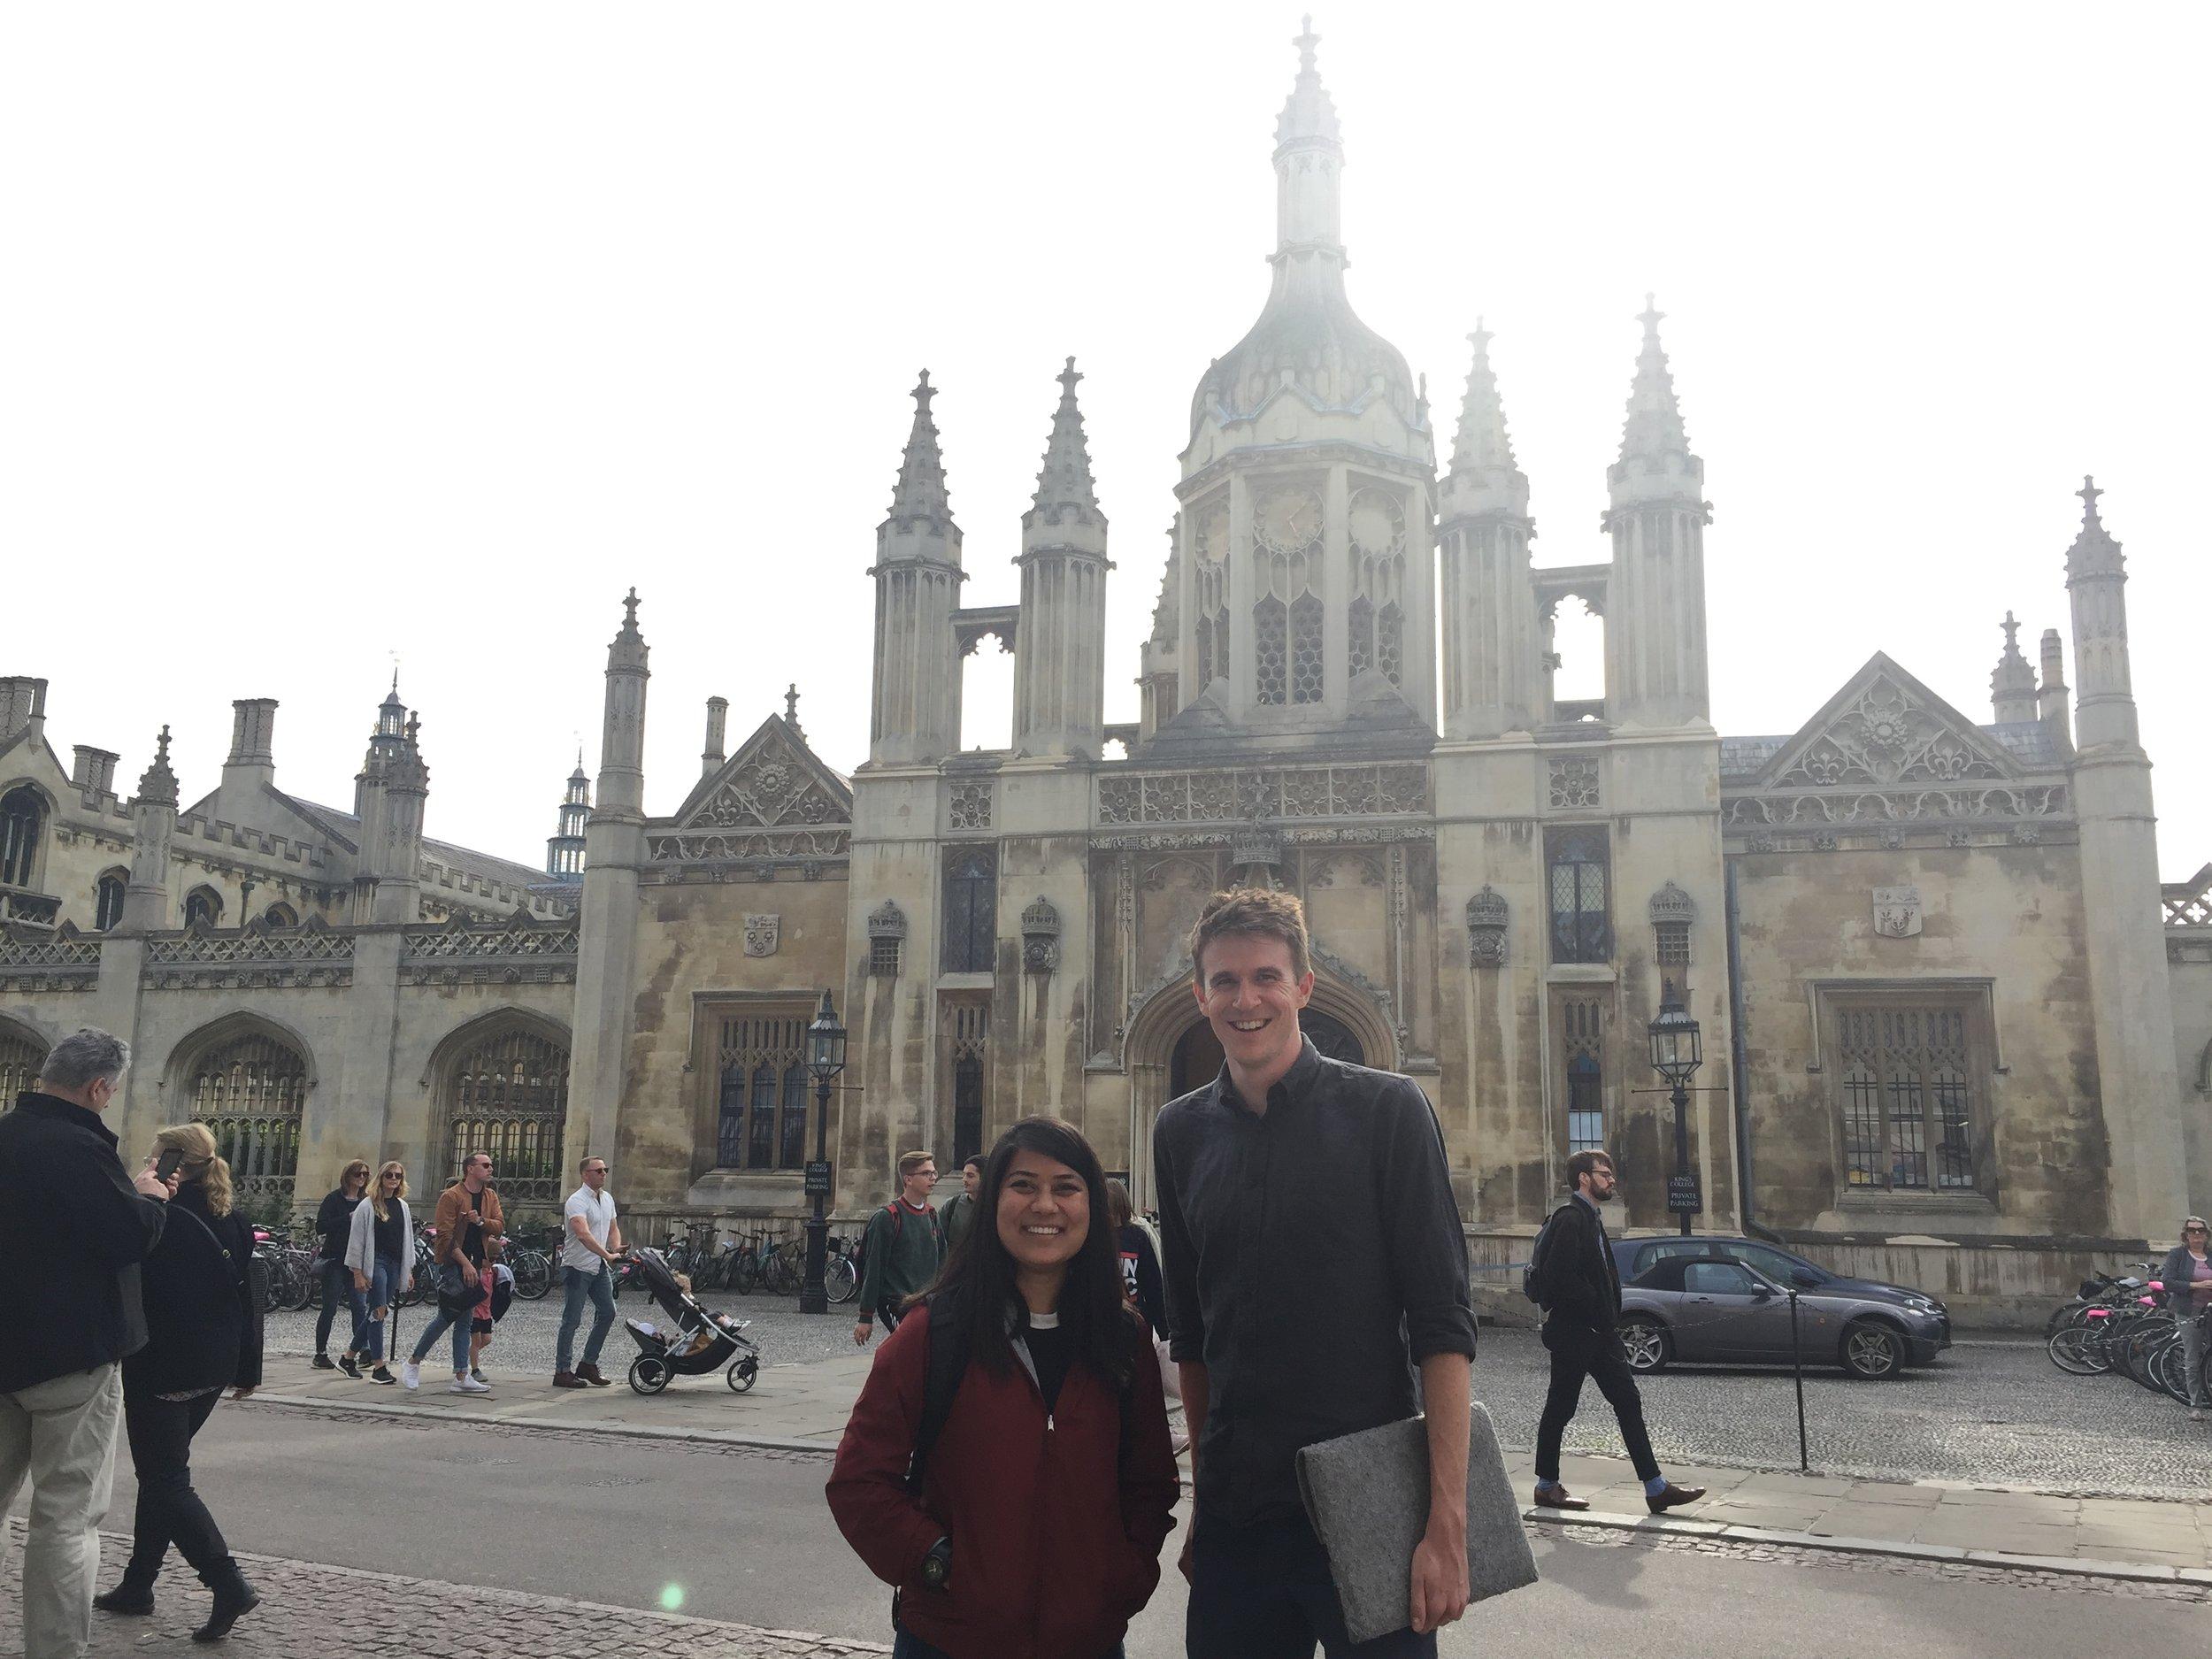 With Thomas Simpson at Cambridge